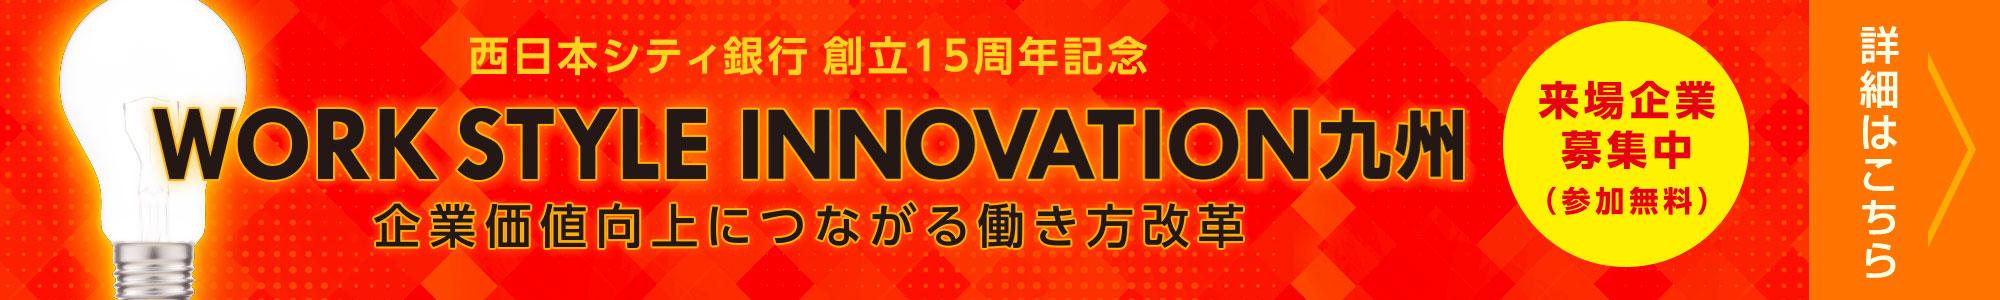 WORK STYLE INNOVATION九州